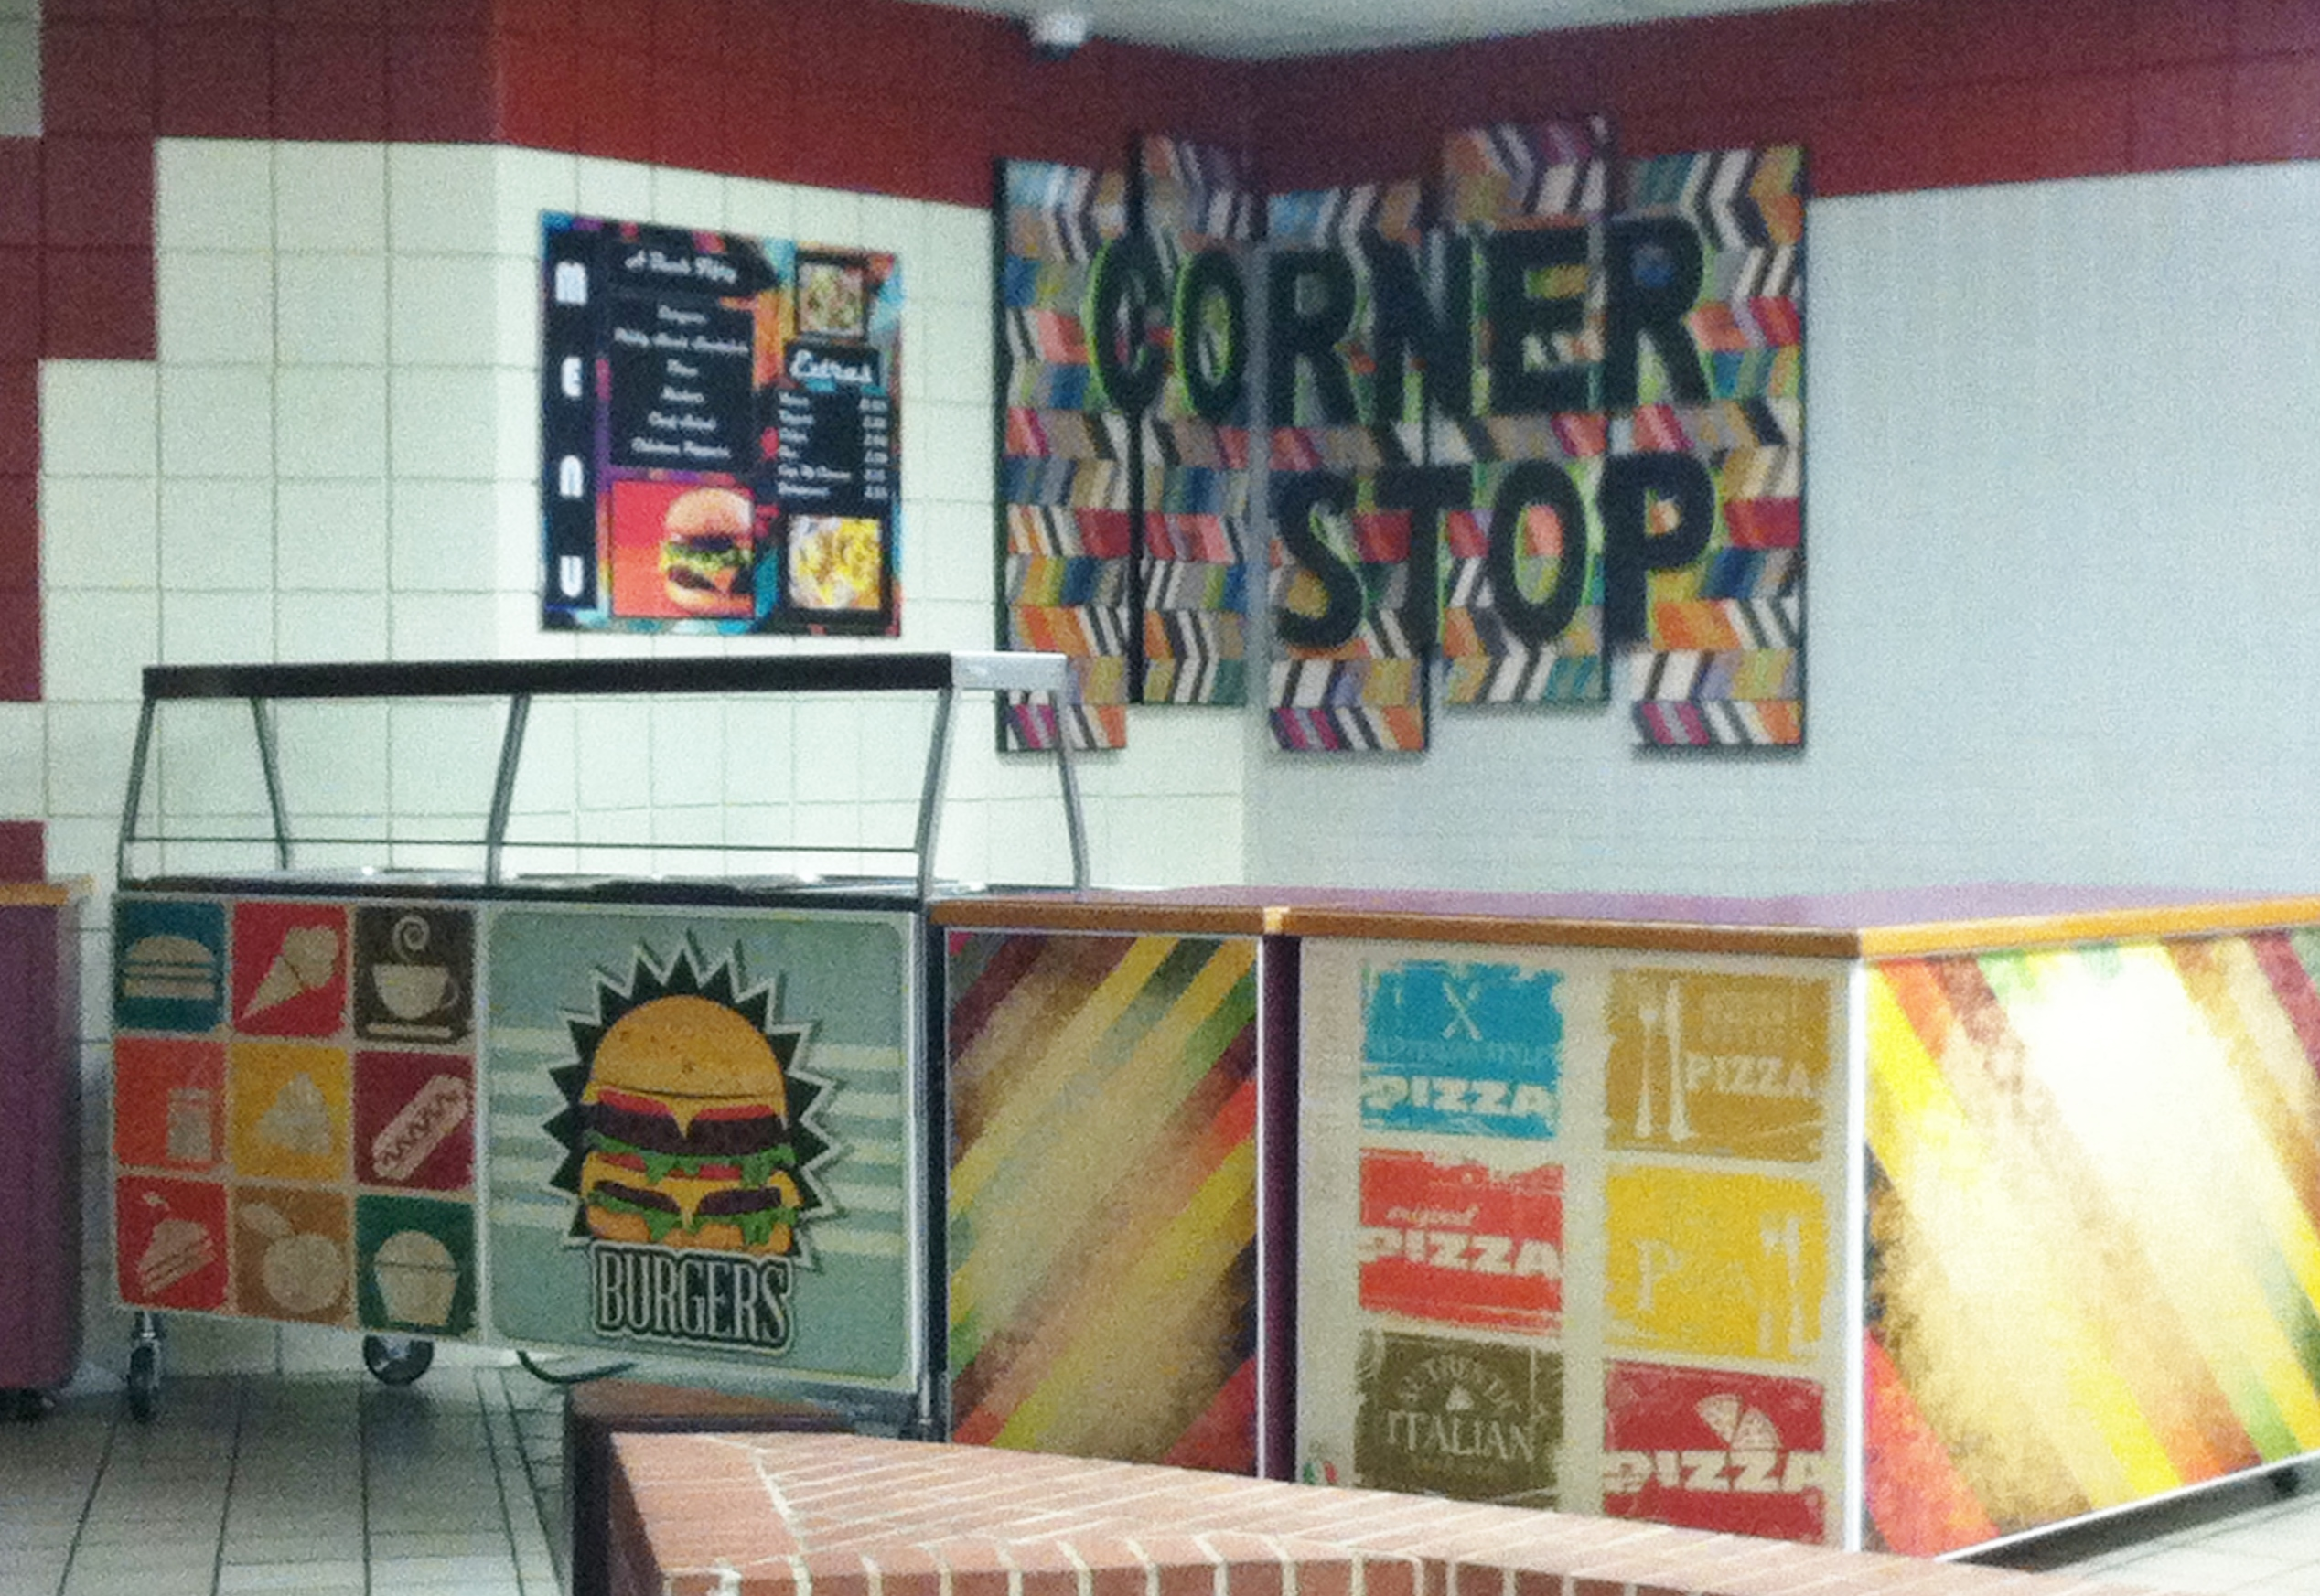 Corner Stop